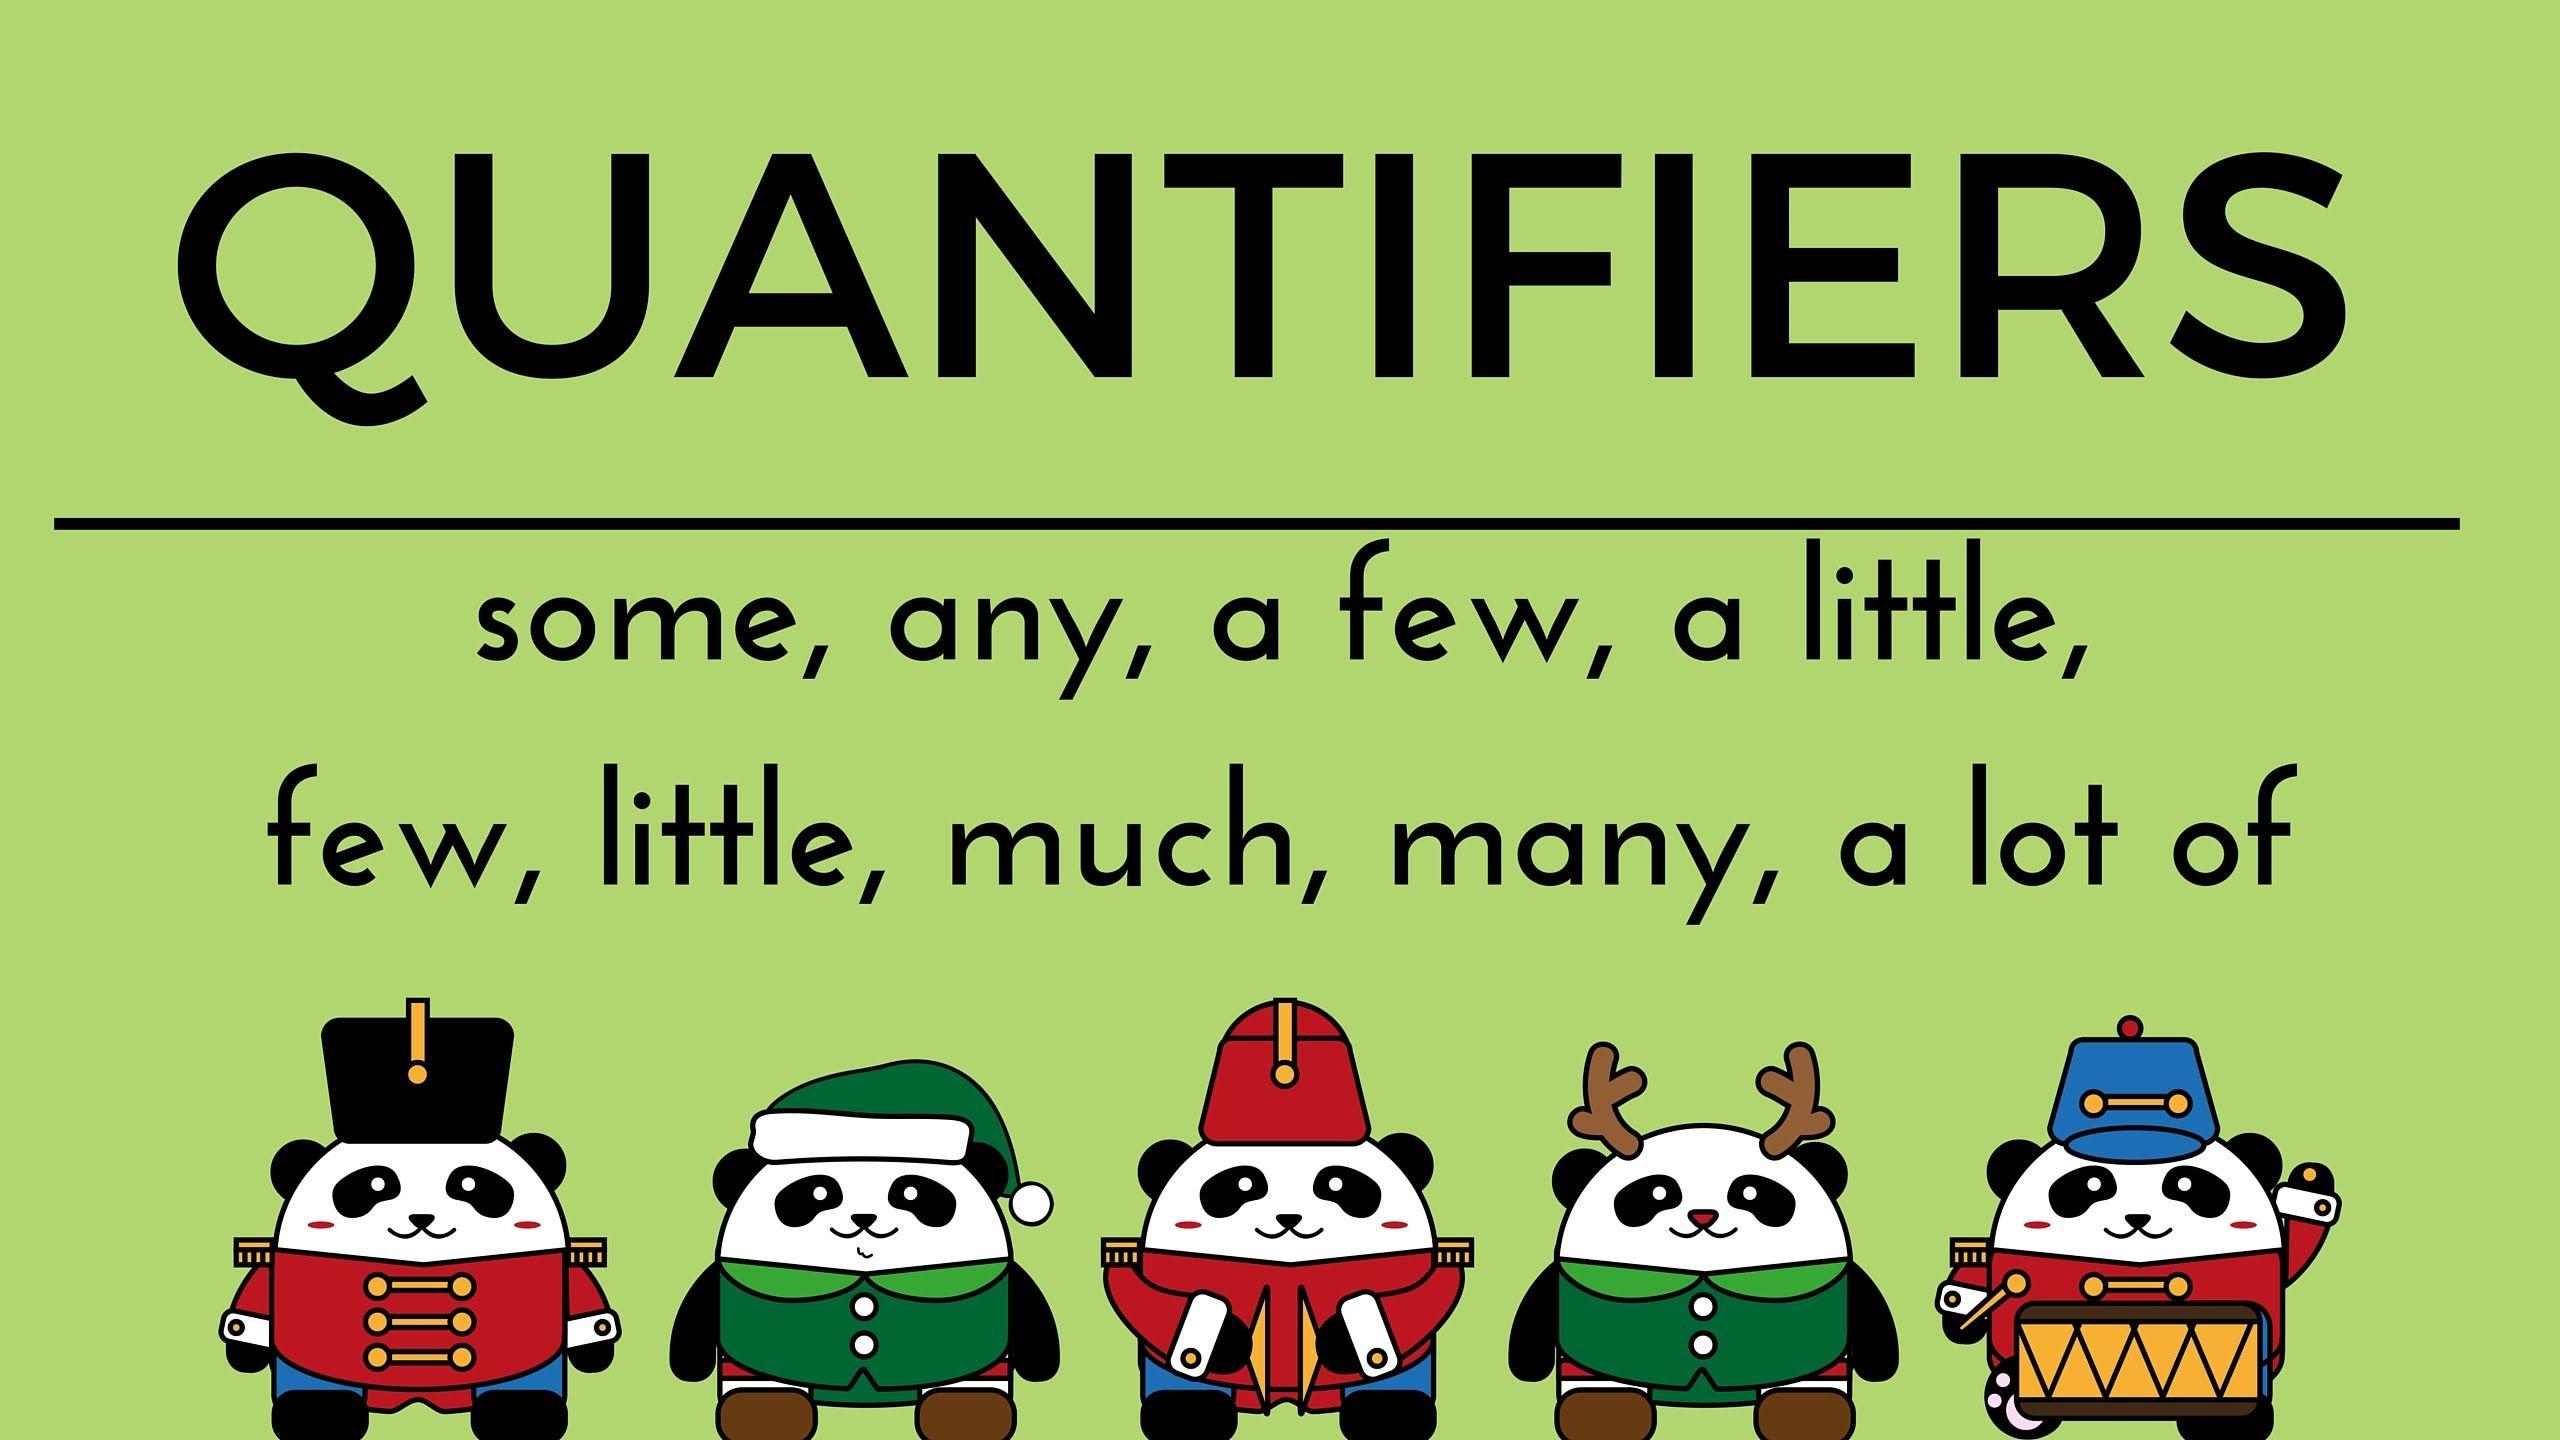 QUANTIFIERS - some, any, a few, a little, few, little ...